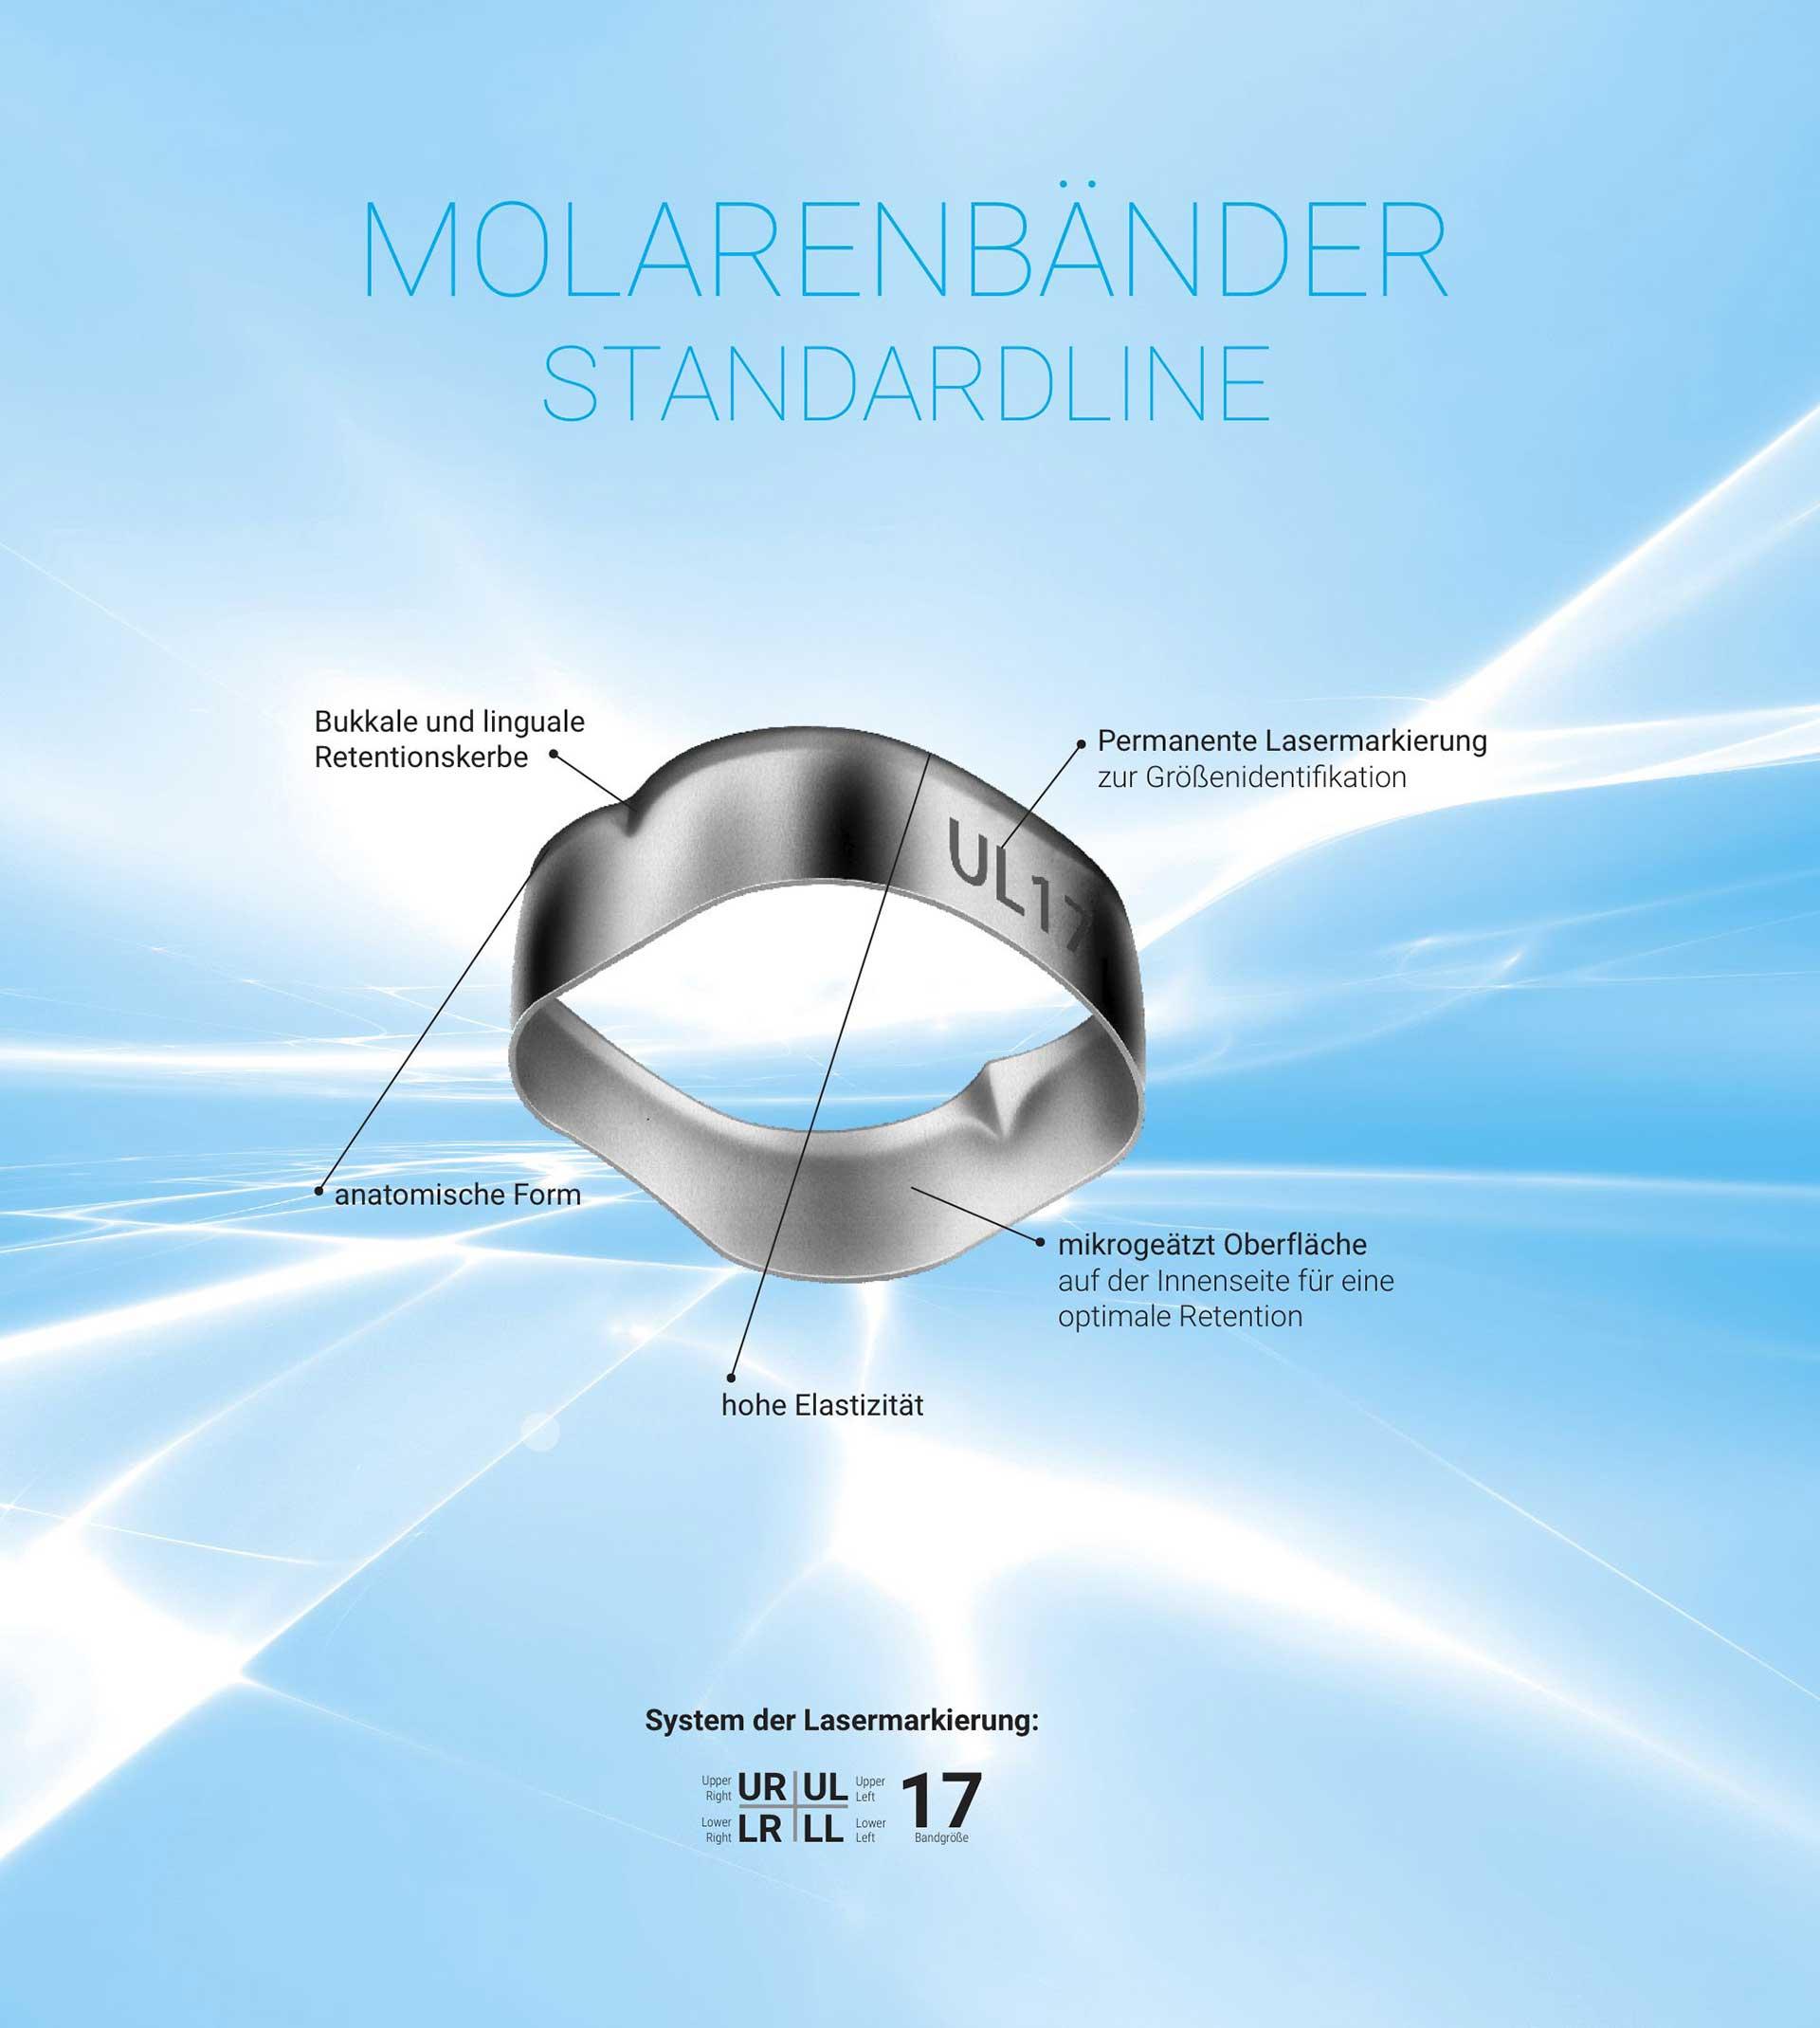 Molarenbänder standardLine